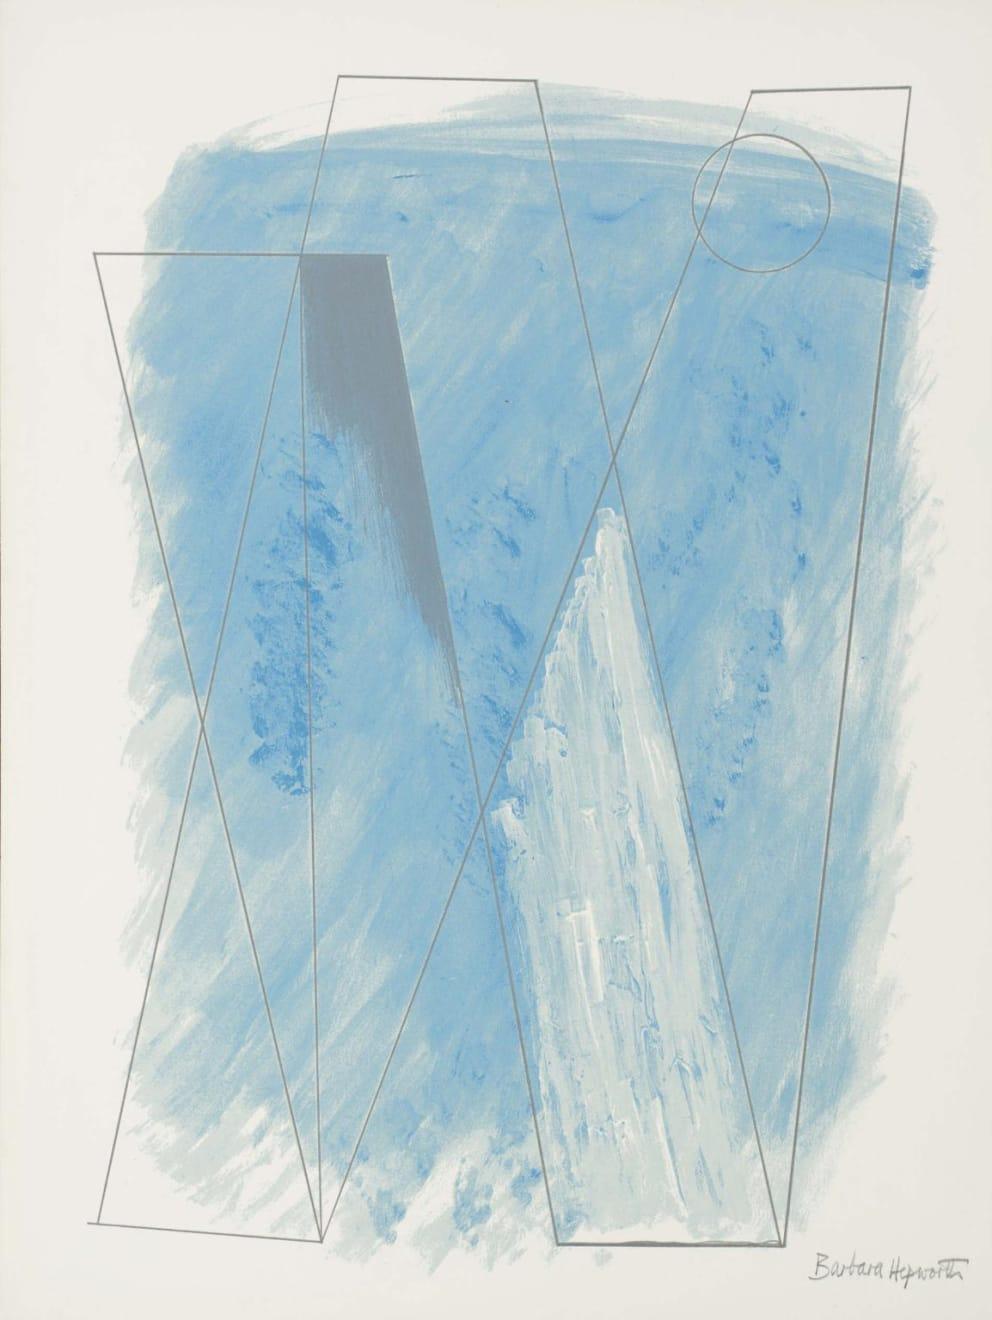 Barbara Hepworth, Three Forms, 1970